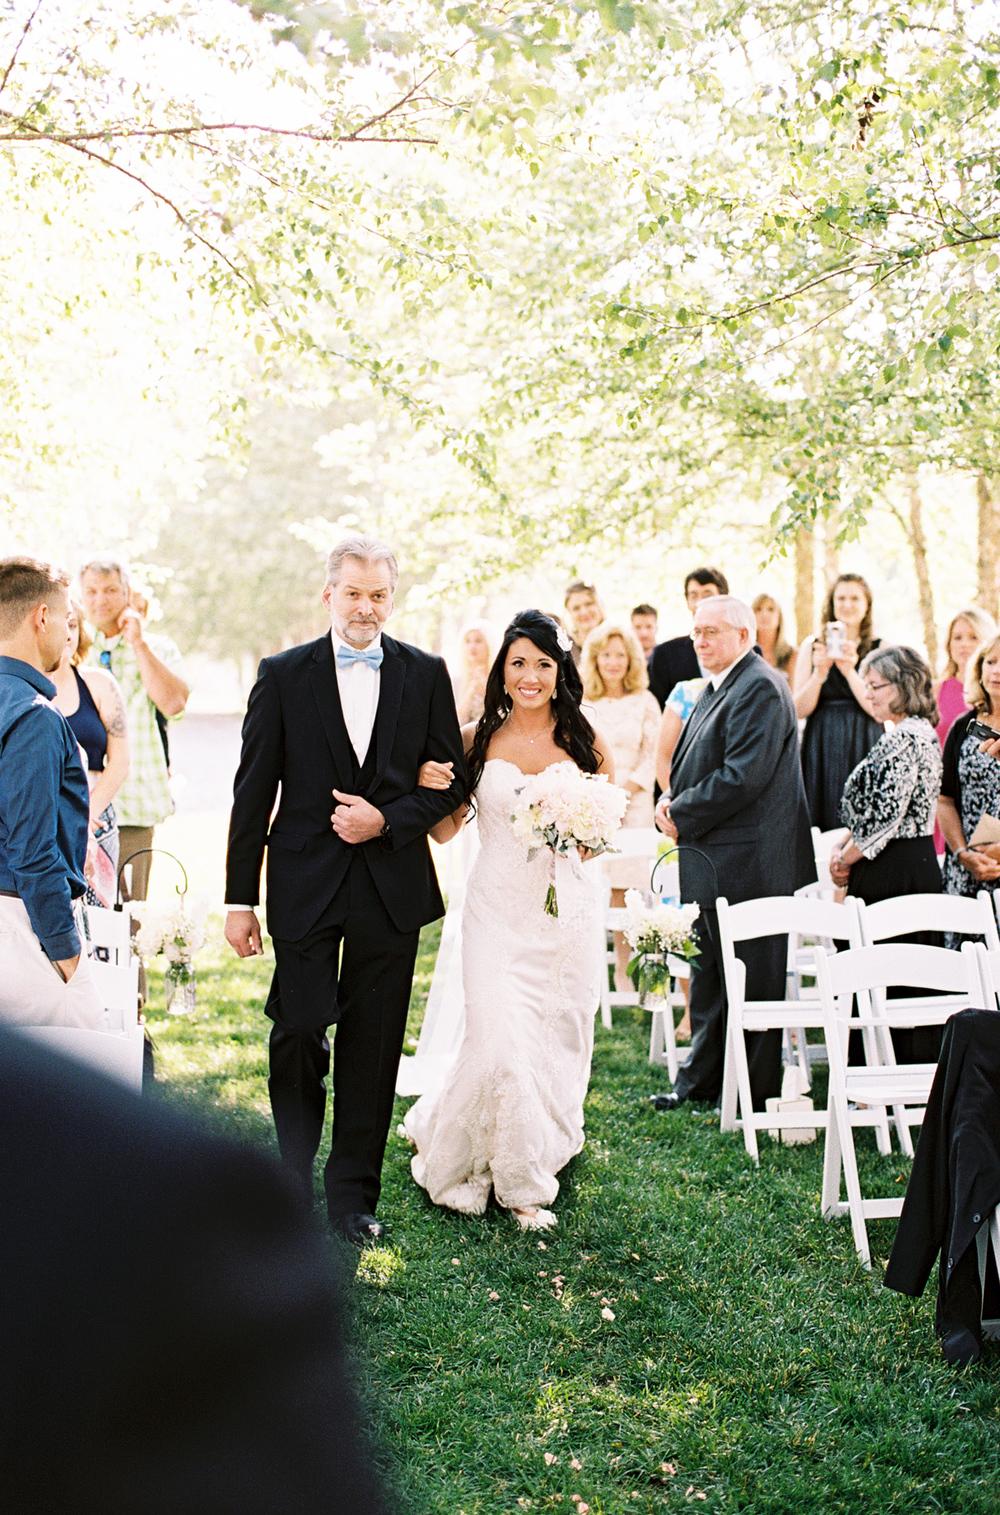 mcguires-millrace-farm-wedding-027.jpg